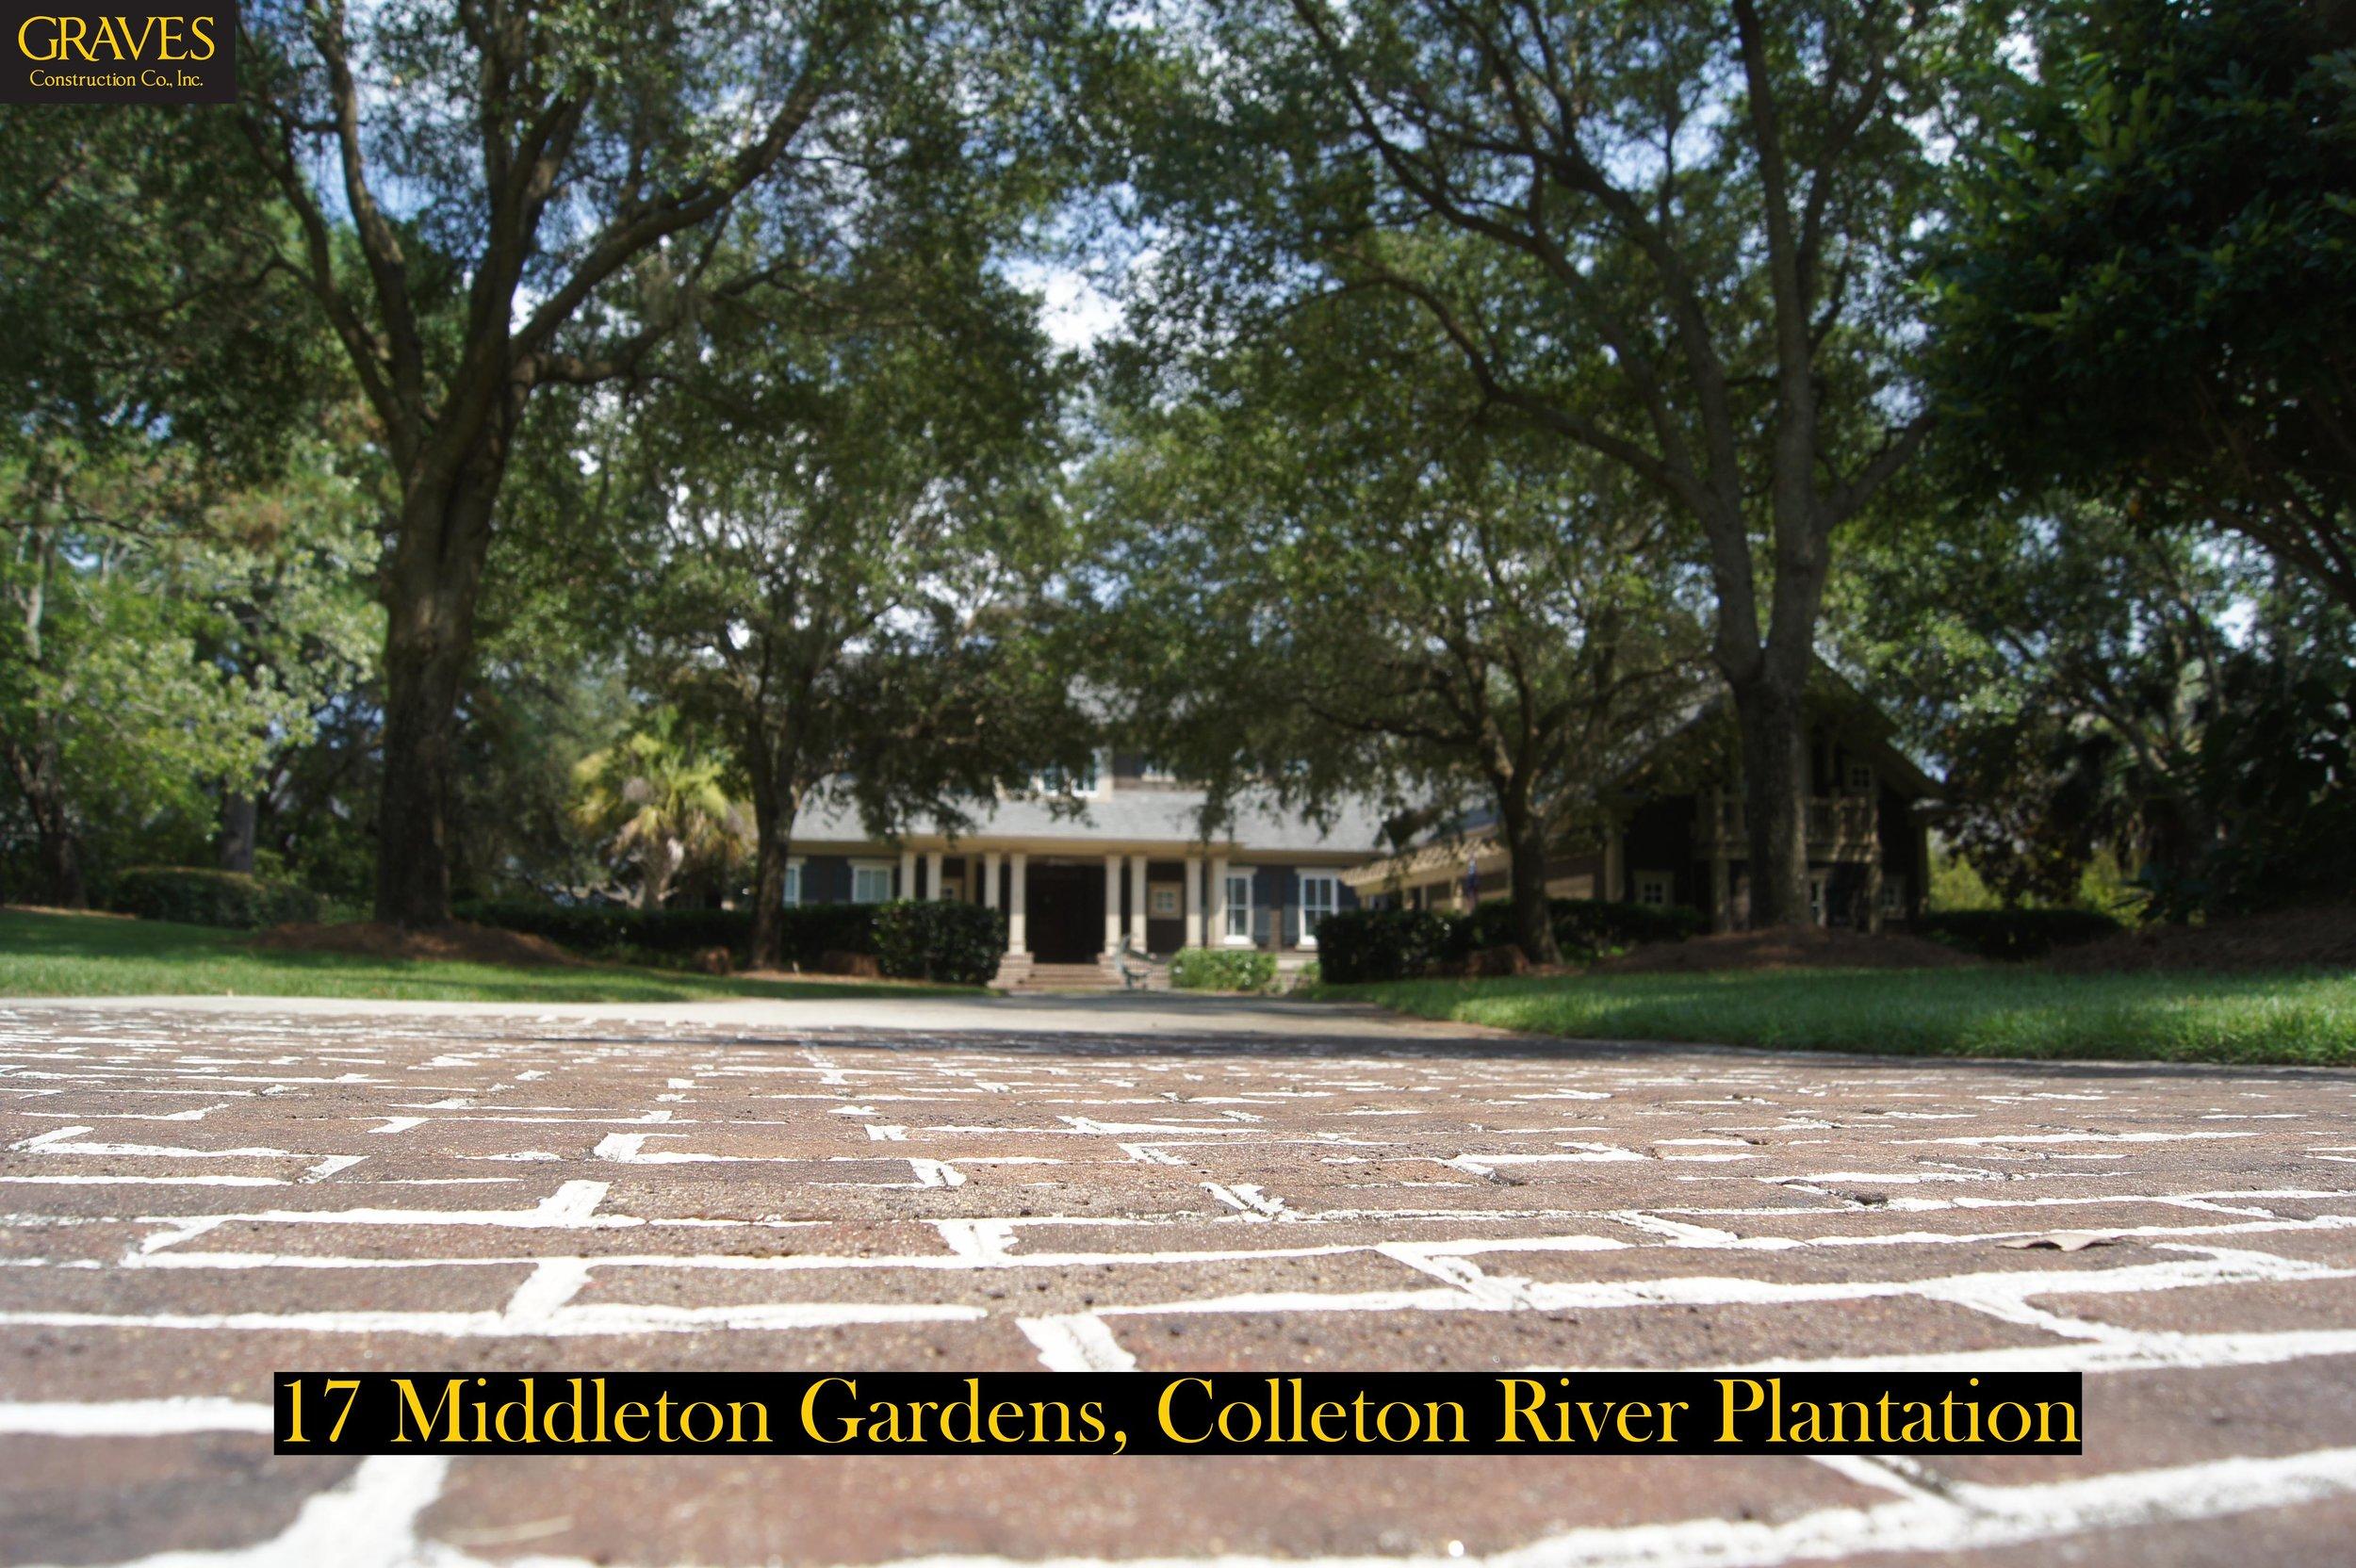 17 Middleton Gardens - 7